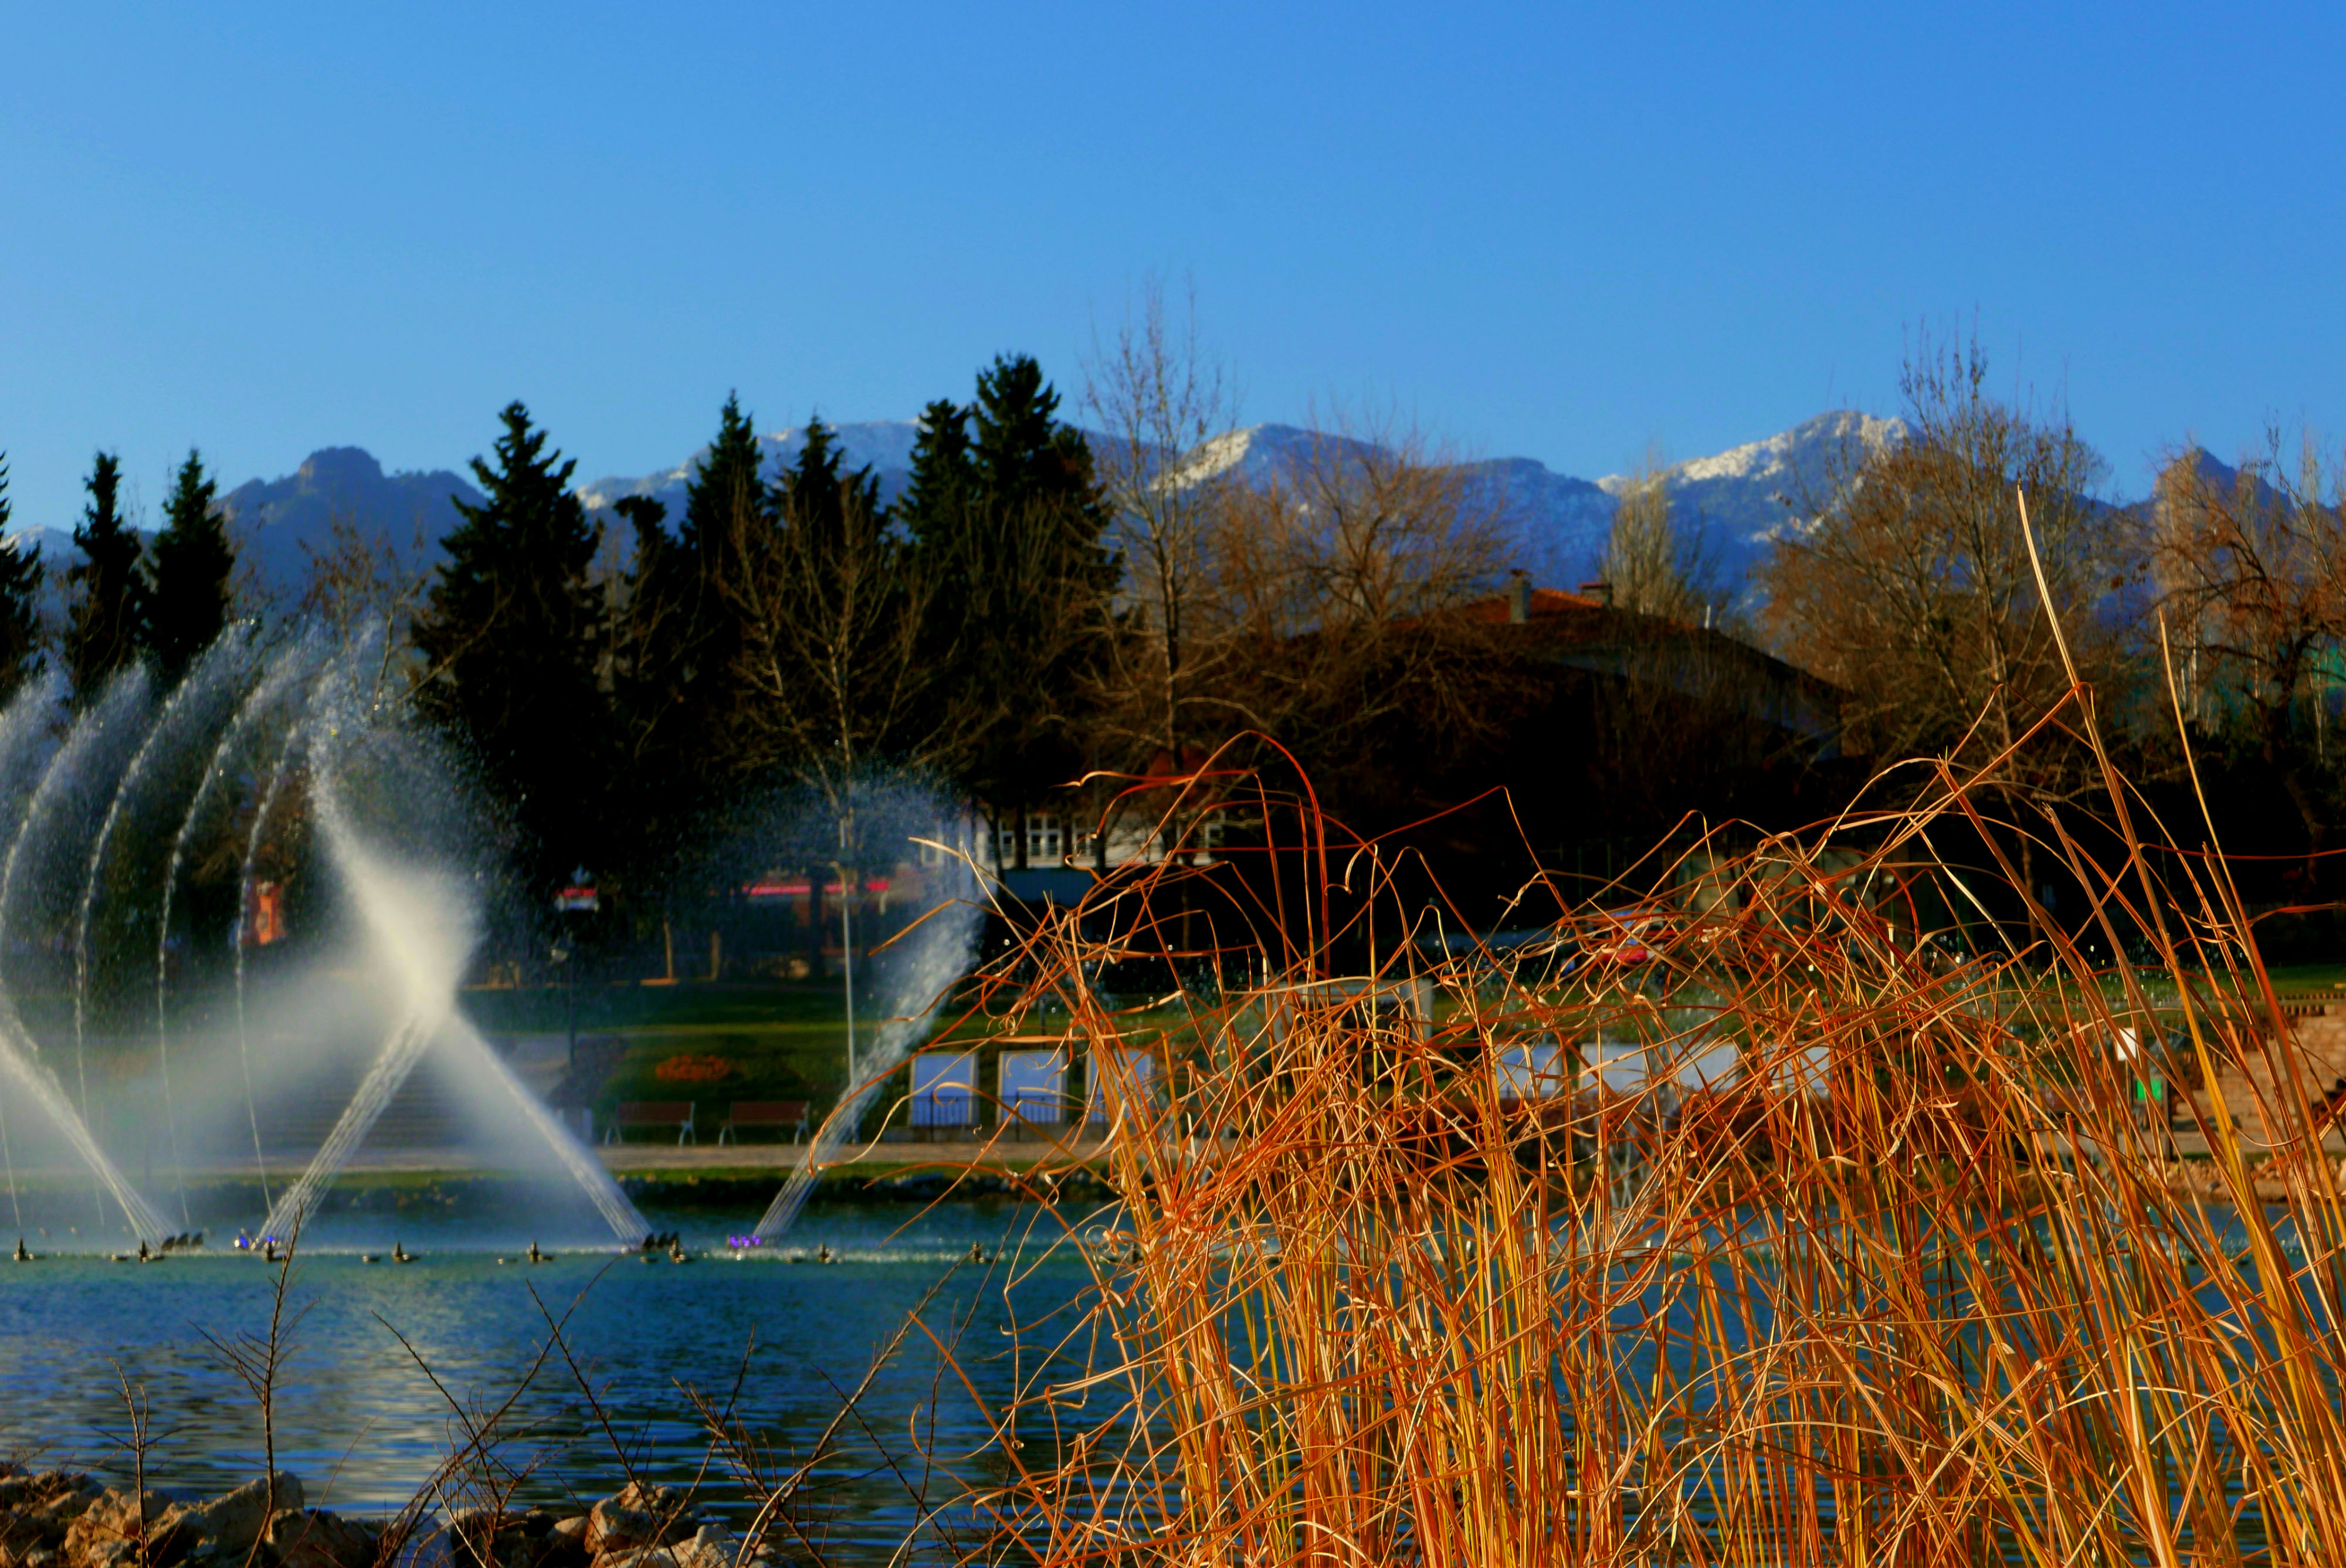 Incilipinar Park in Denizli, Turkey